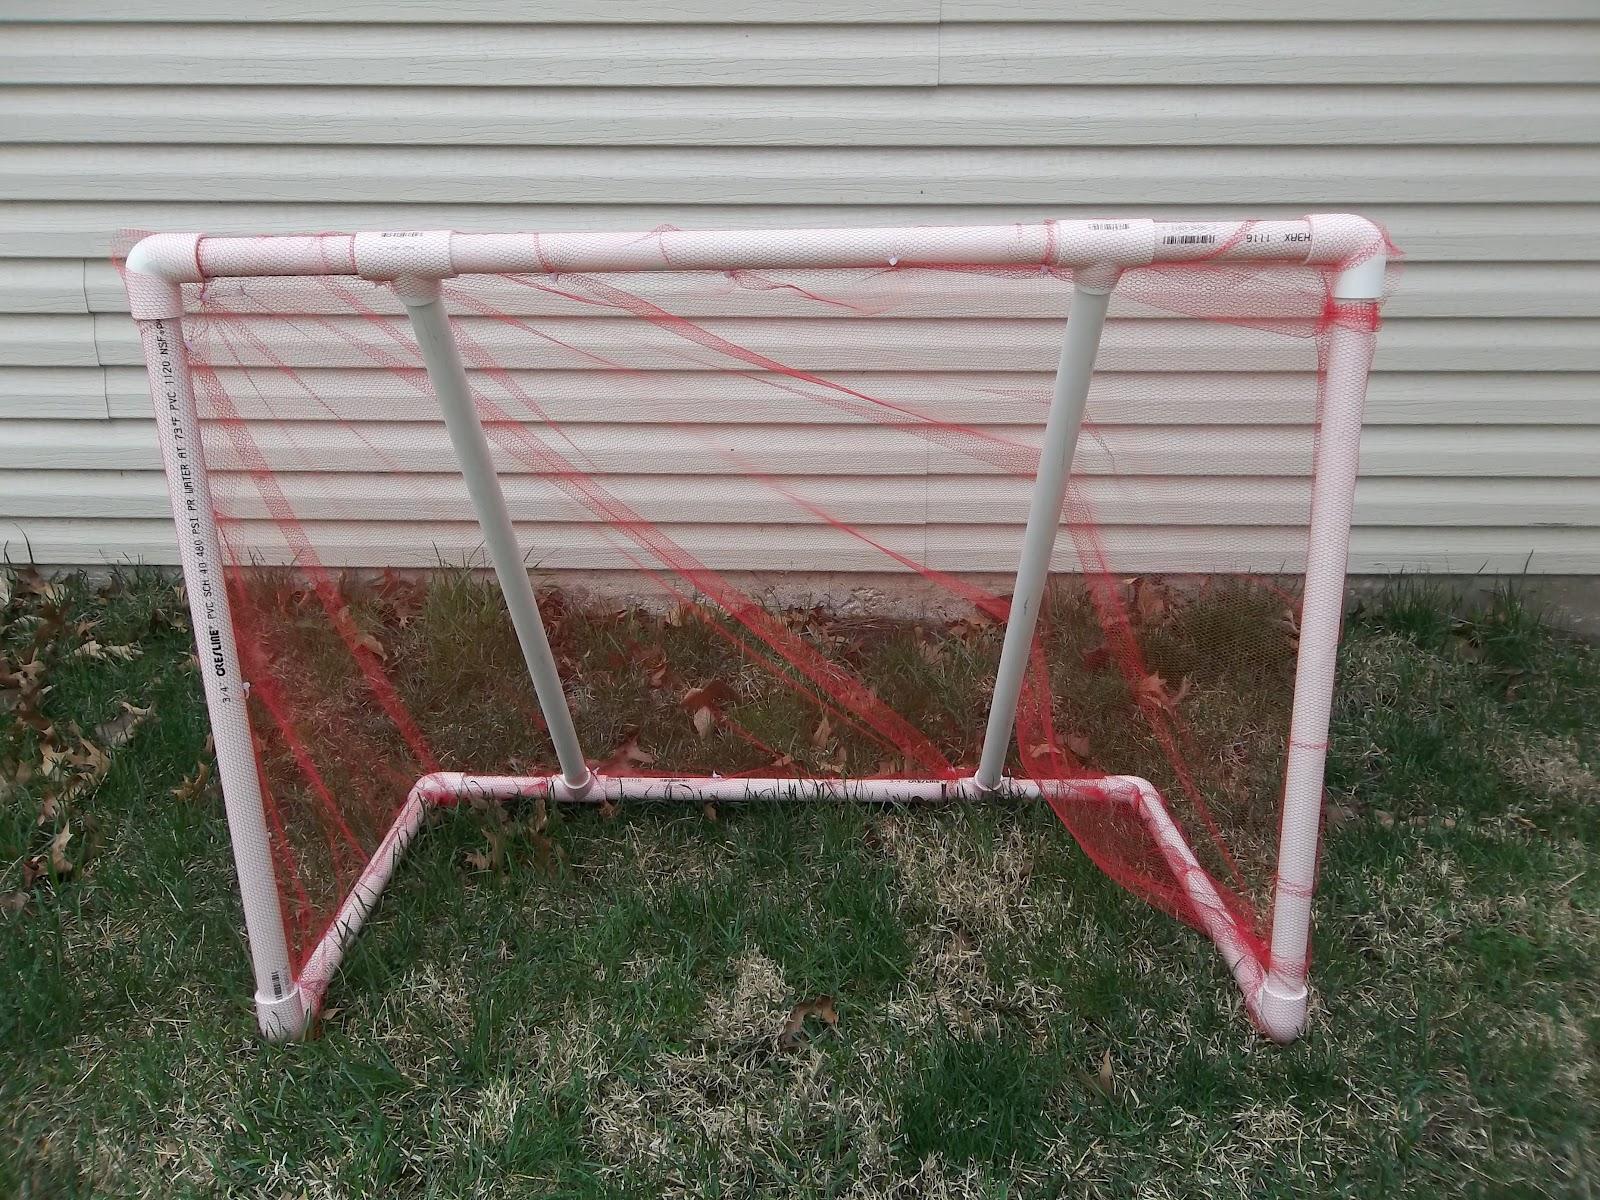 PVC Pipe Soccer Goal